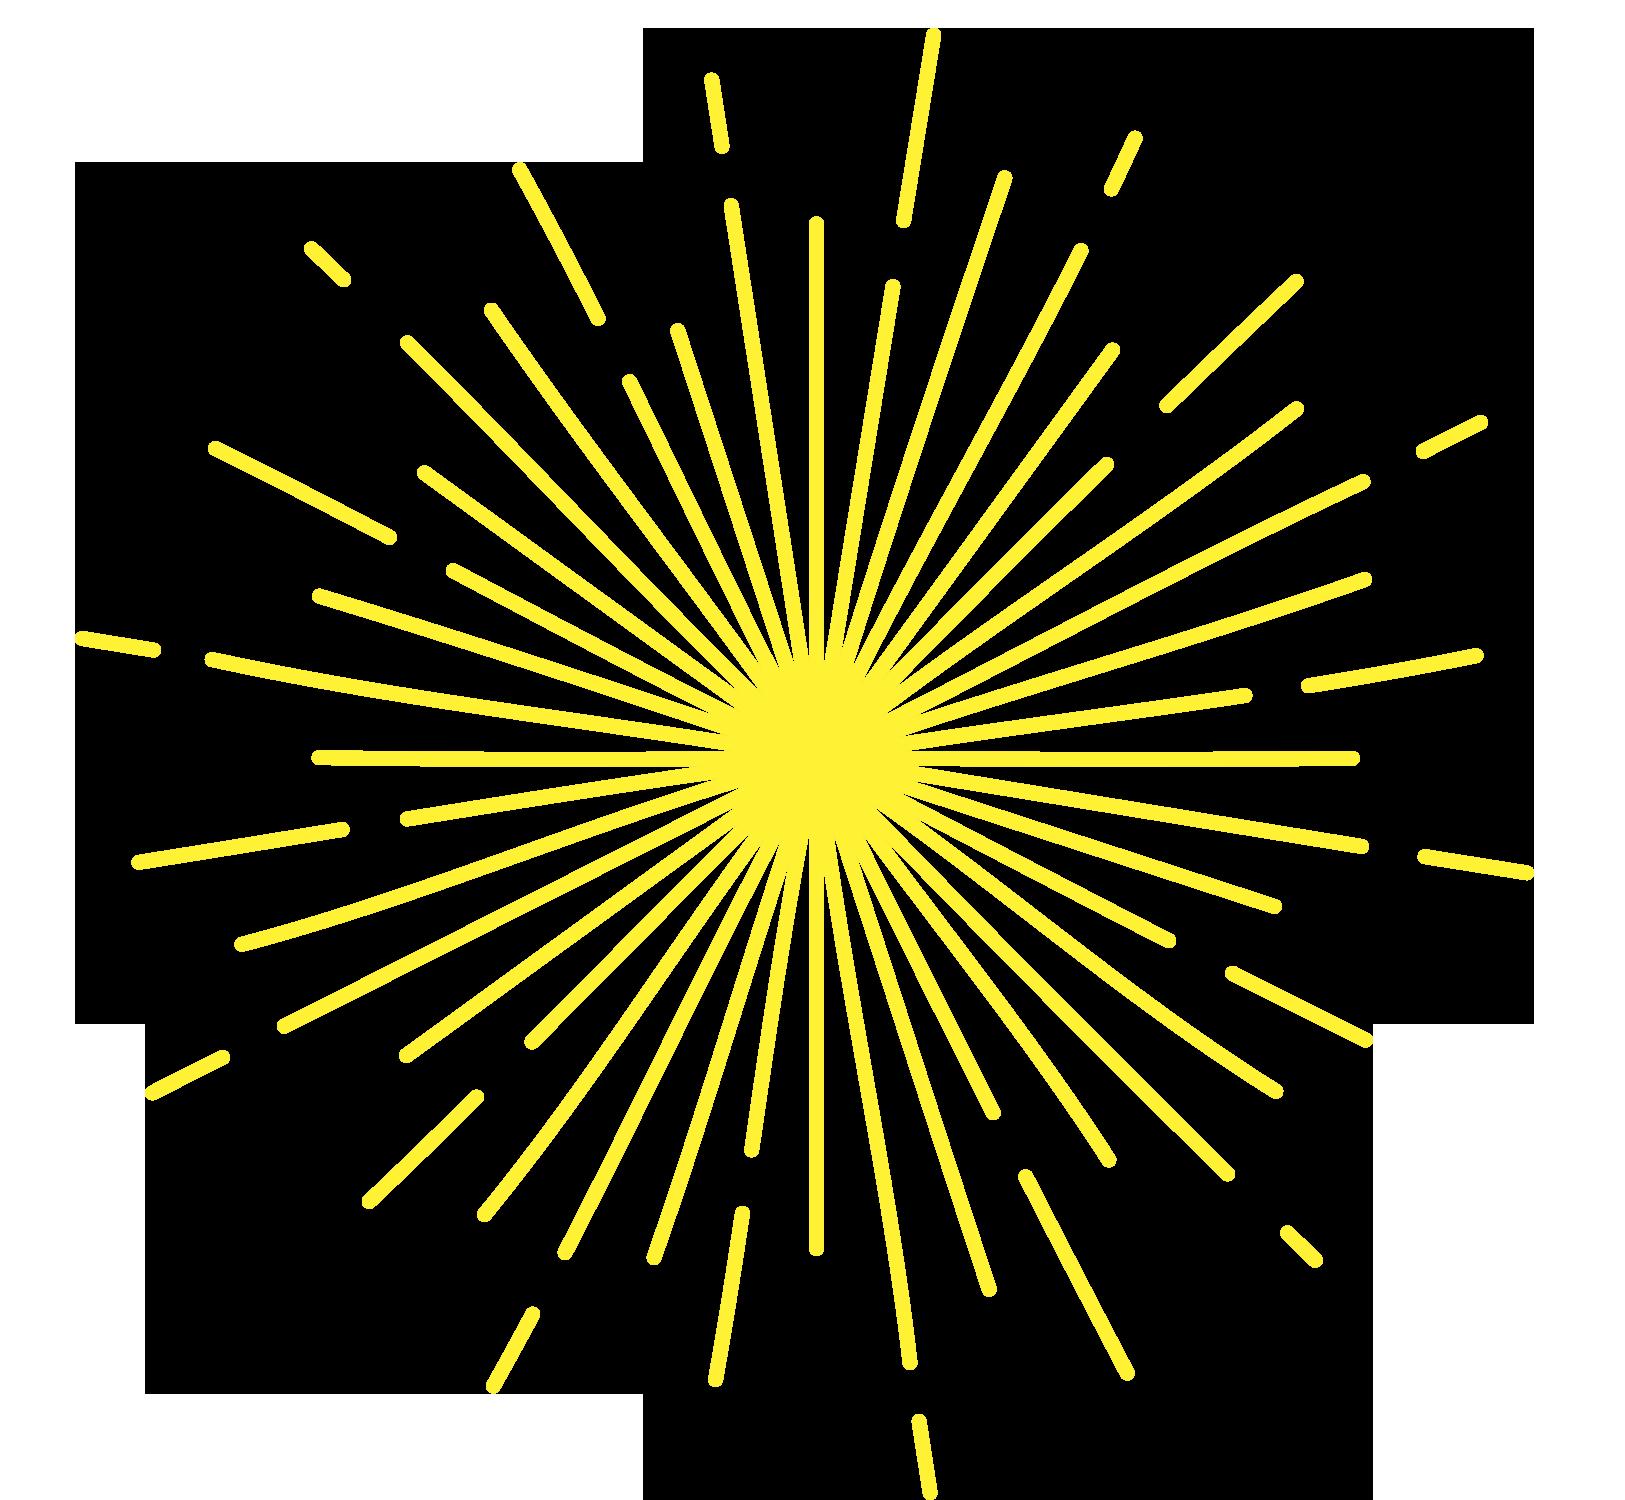 yellowstarbig